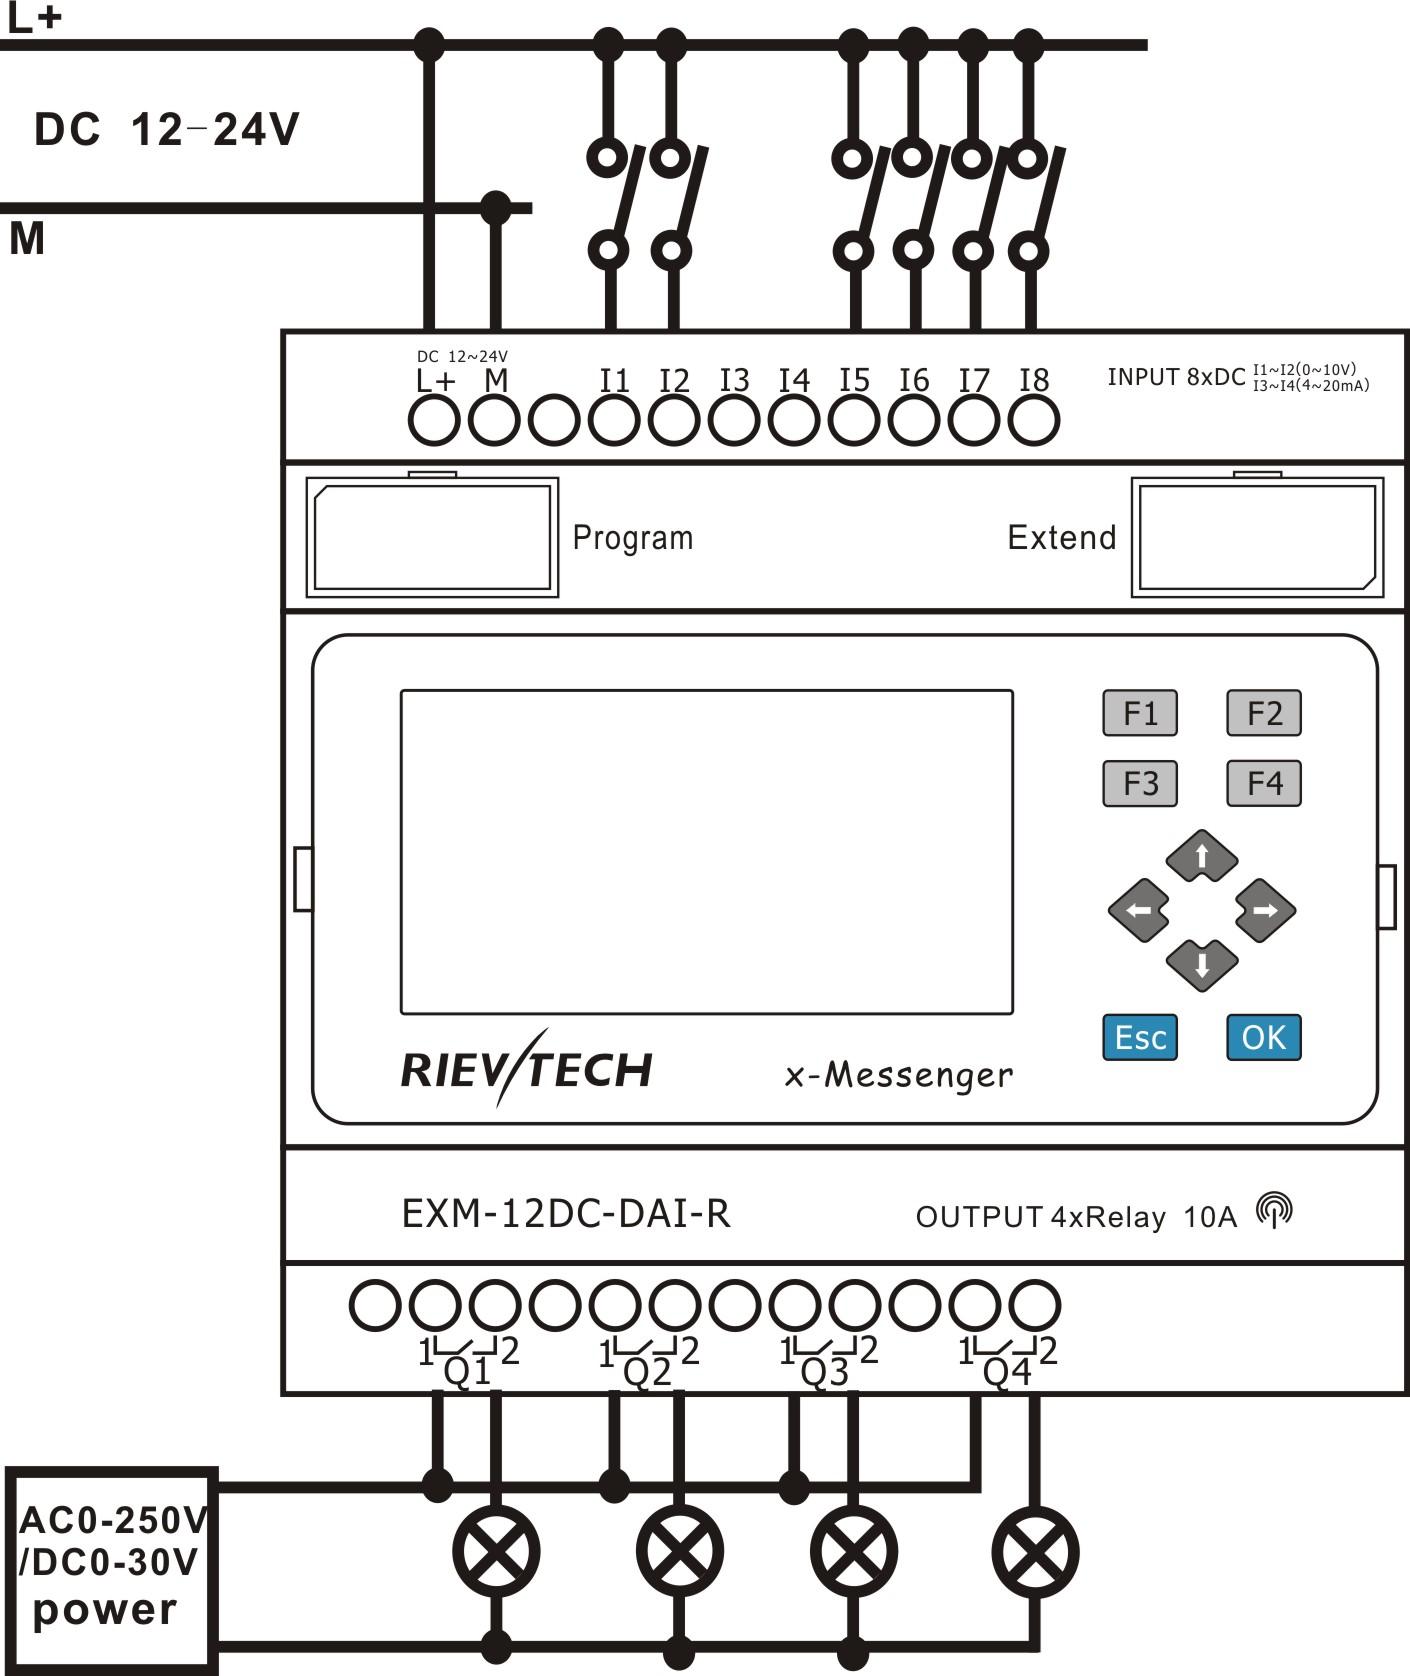 exm 12dc dai r hmi buy gprs plc  gsm plc  sms plc First Fax Machine Fax Machine Clip Art